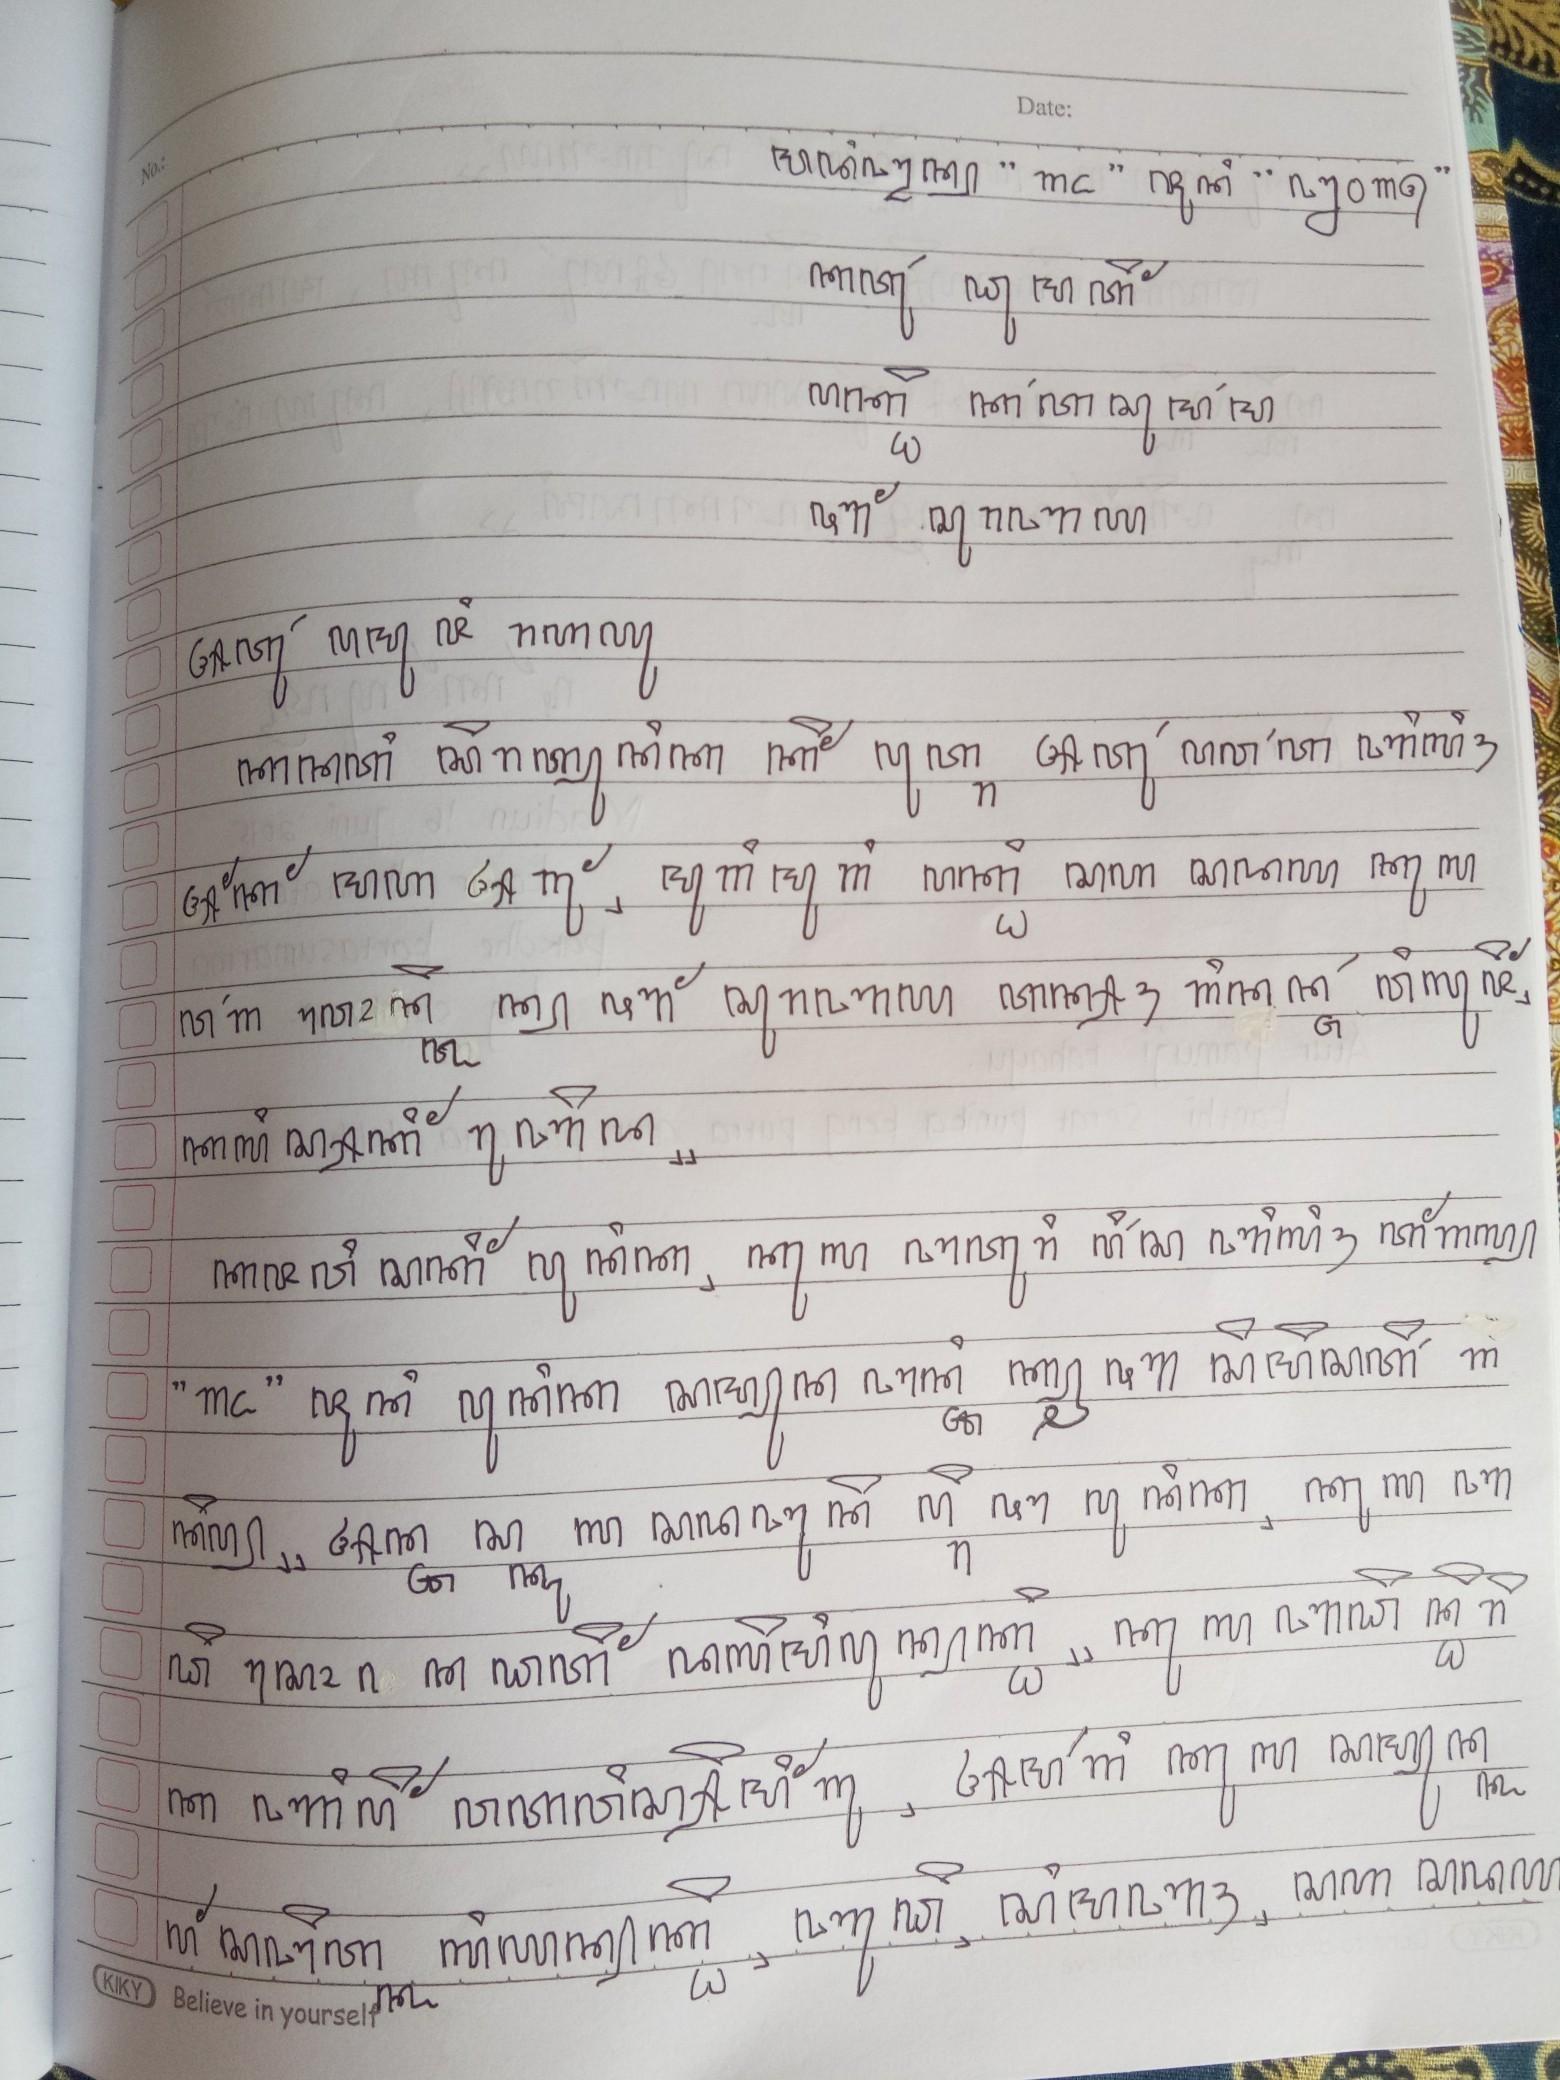 Contoh Surat Aksara Jawa Beserta Artinya Brainly Co Id